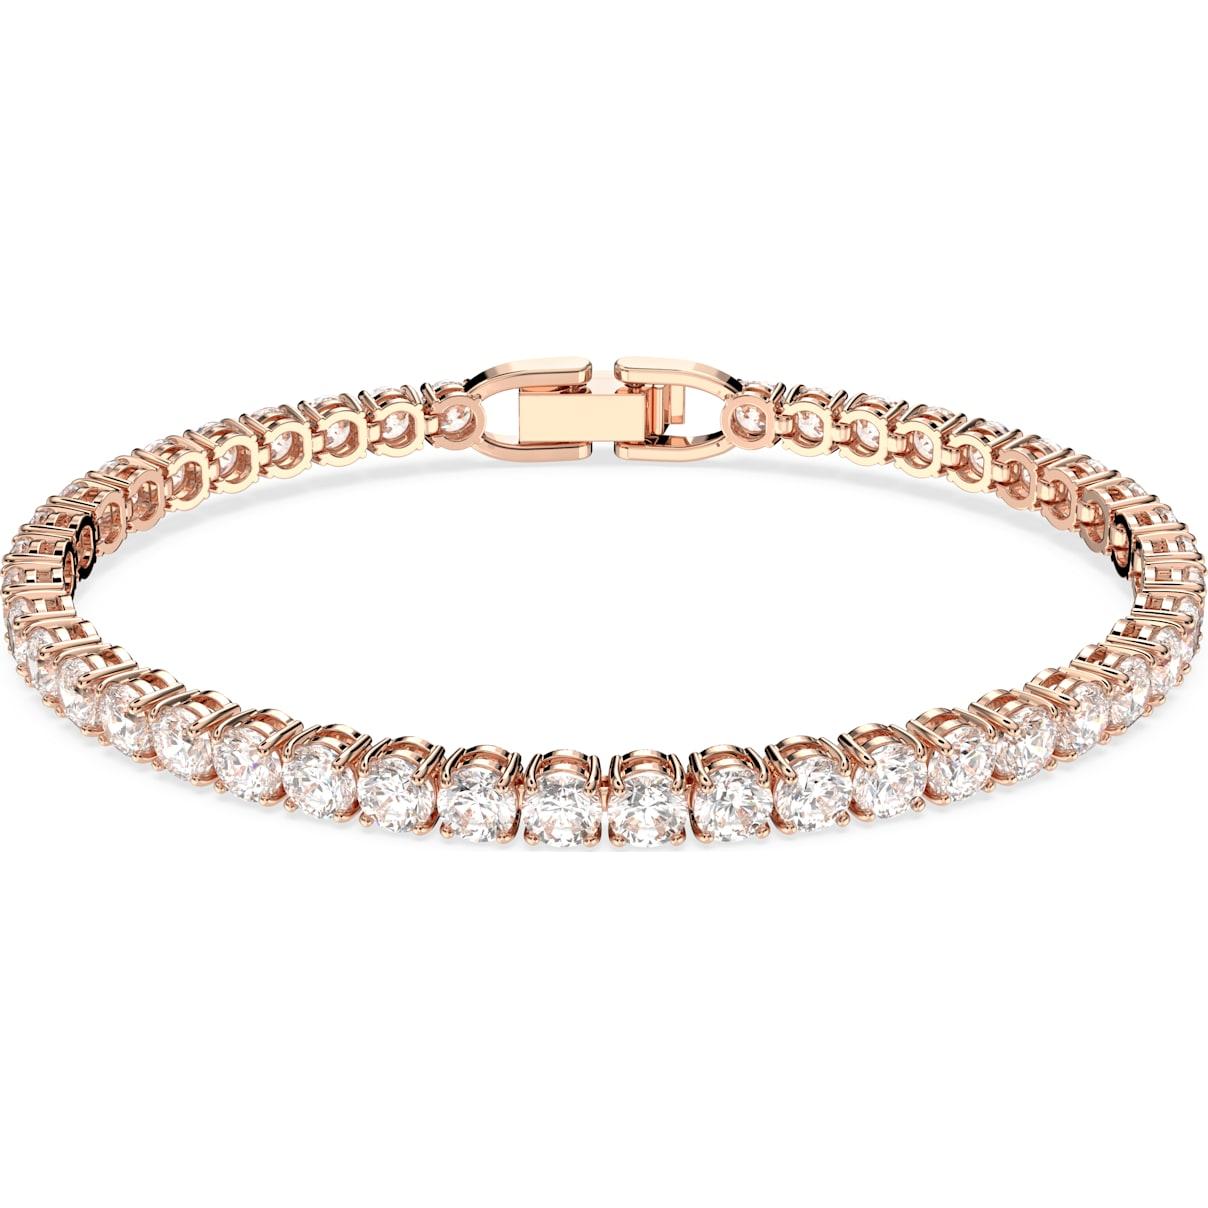 Swarovski Tennis Deluxe Bracelet, White, Rose-gold tone plated